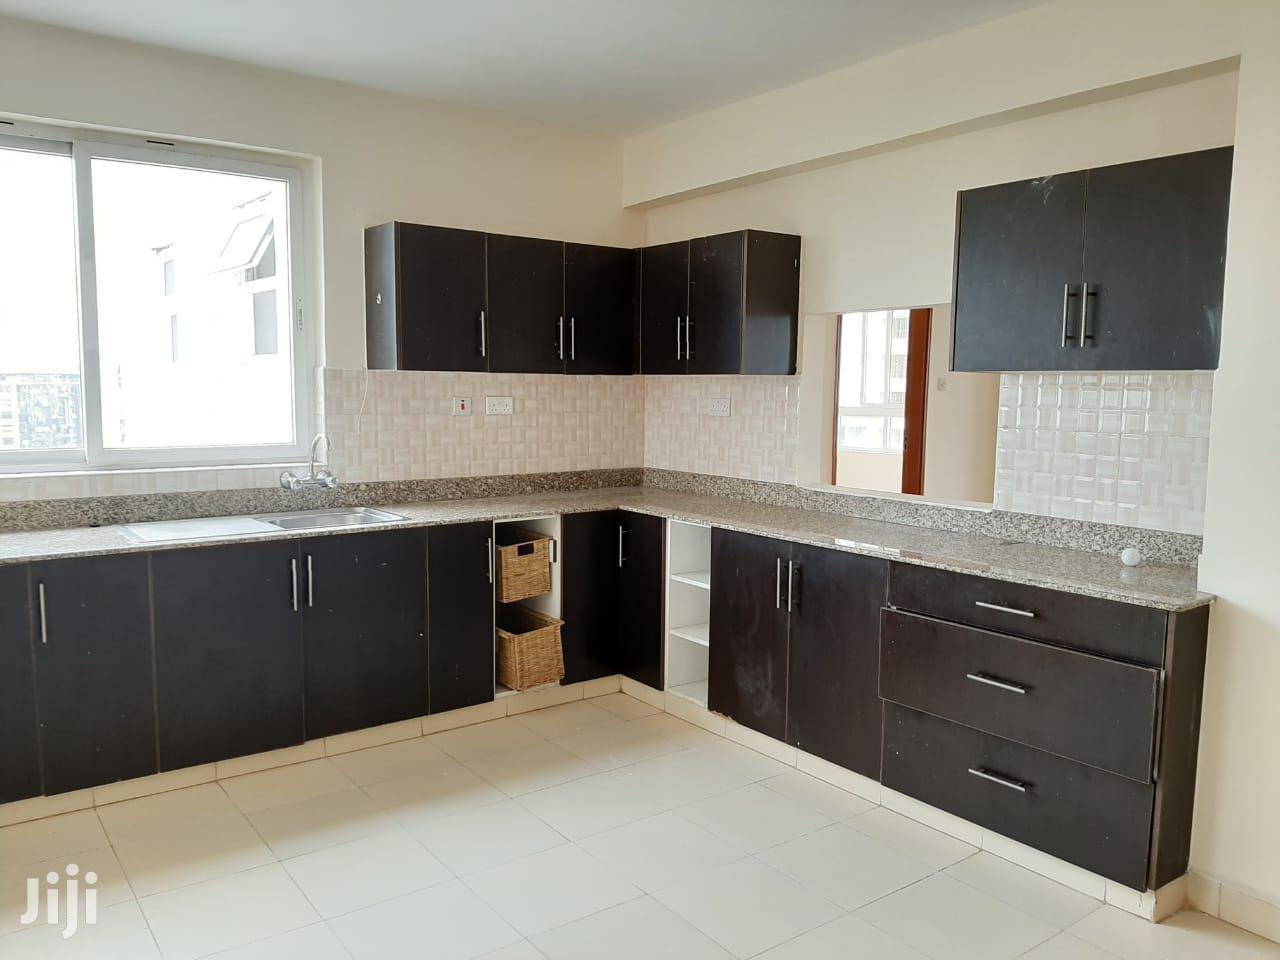 4br Fir Rent Kilimani   Houses & Apartments For Rent for sale in Kilimani, Nairobi, Kenya